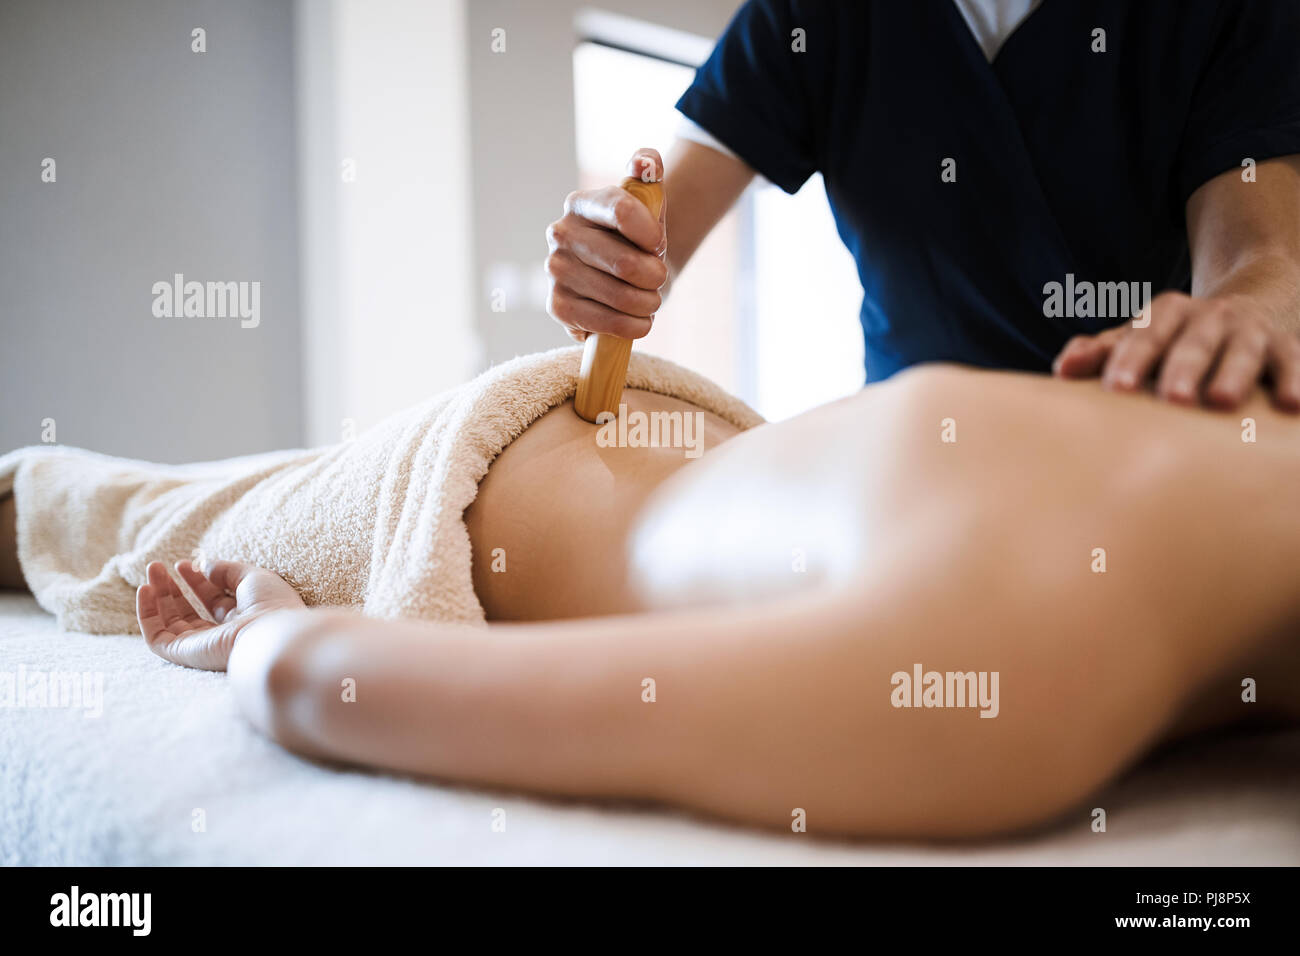 Masseur treating masseuse at wellness saloon Stock Photo